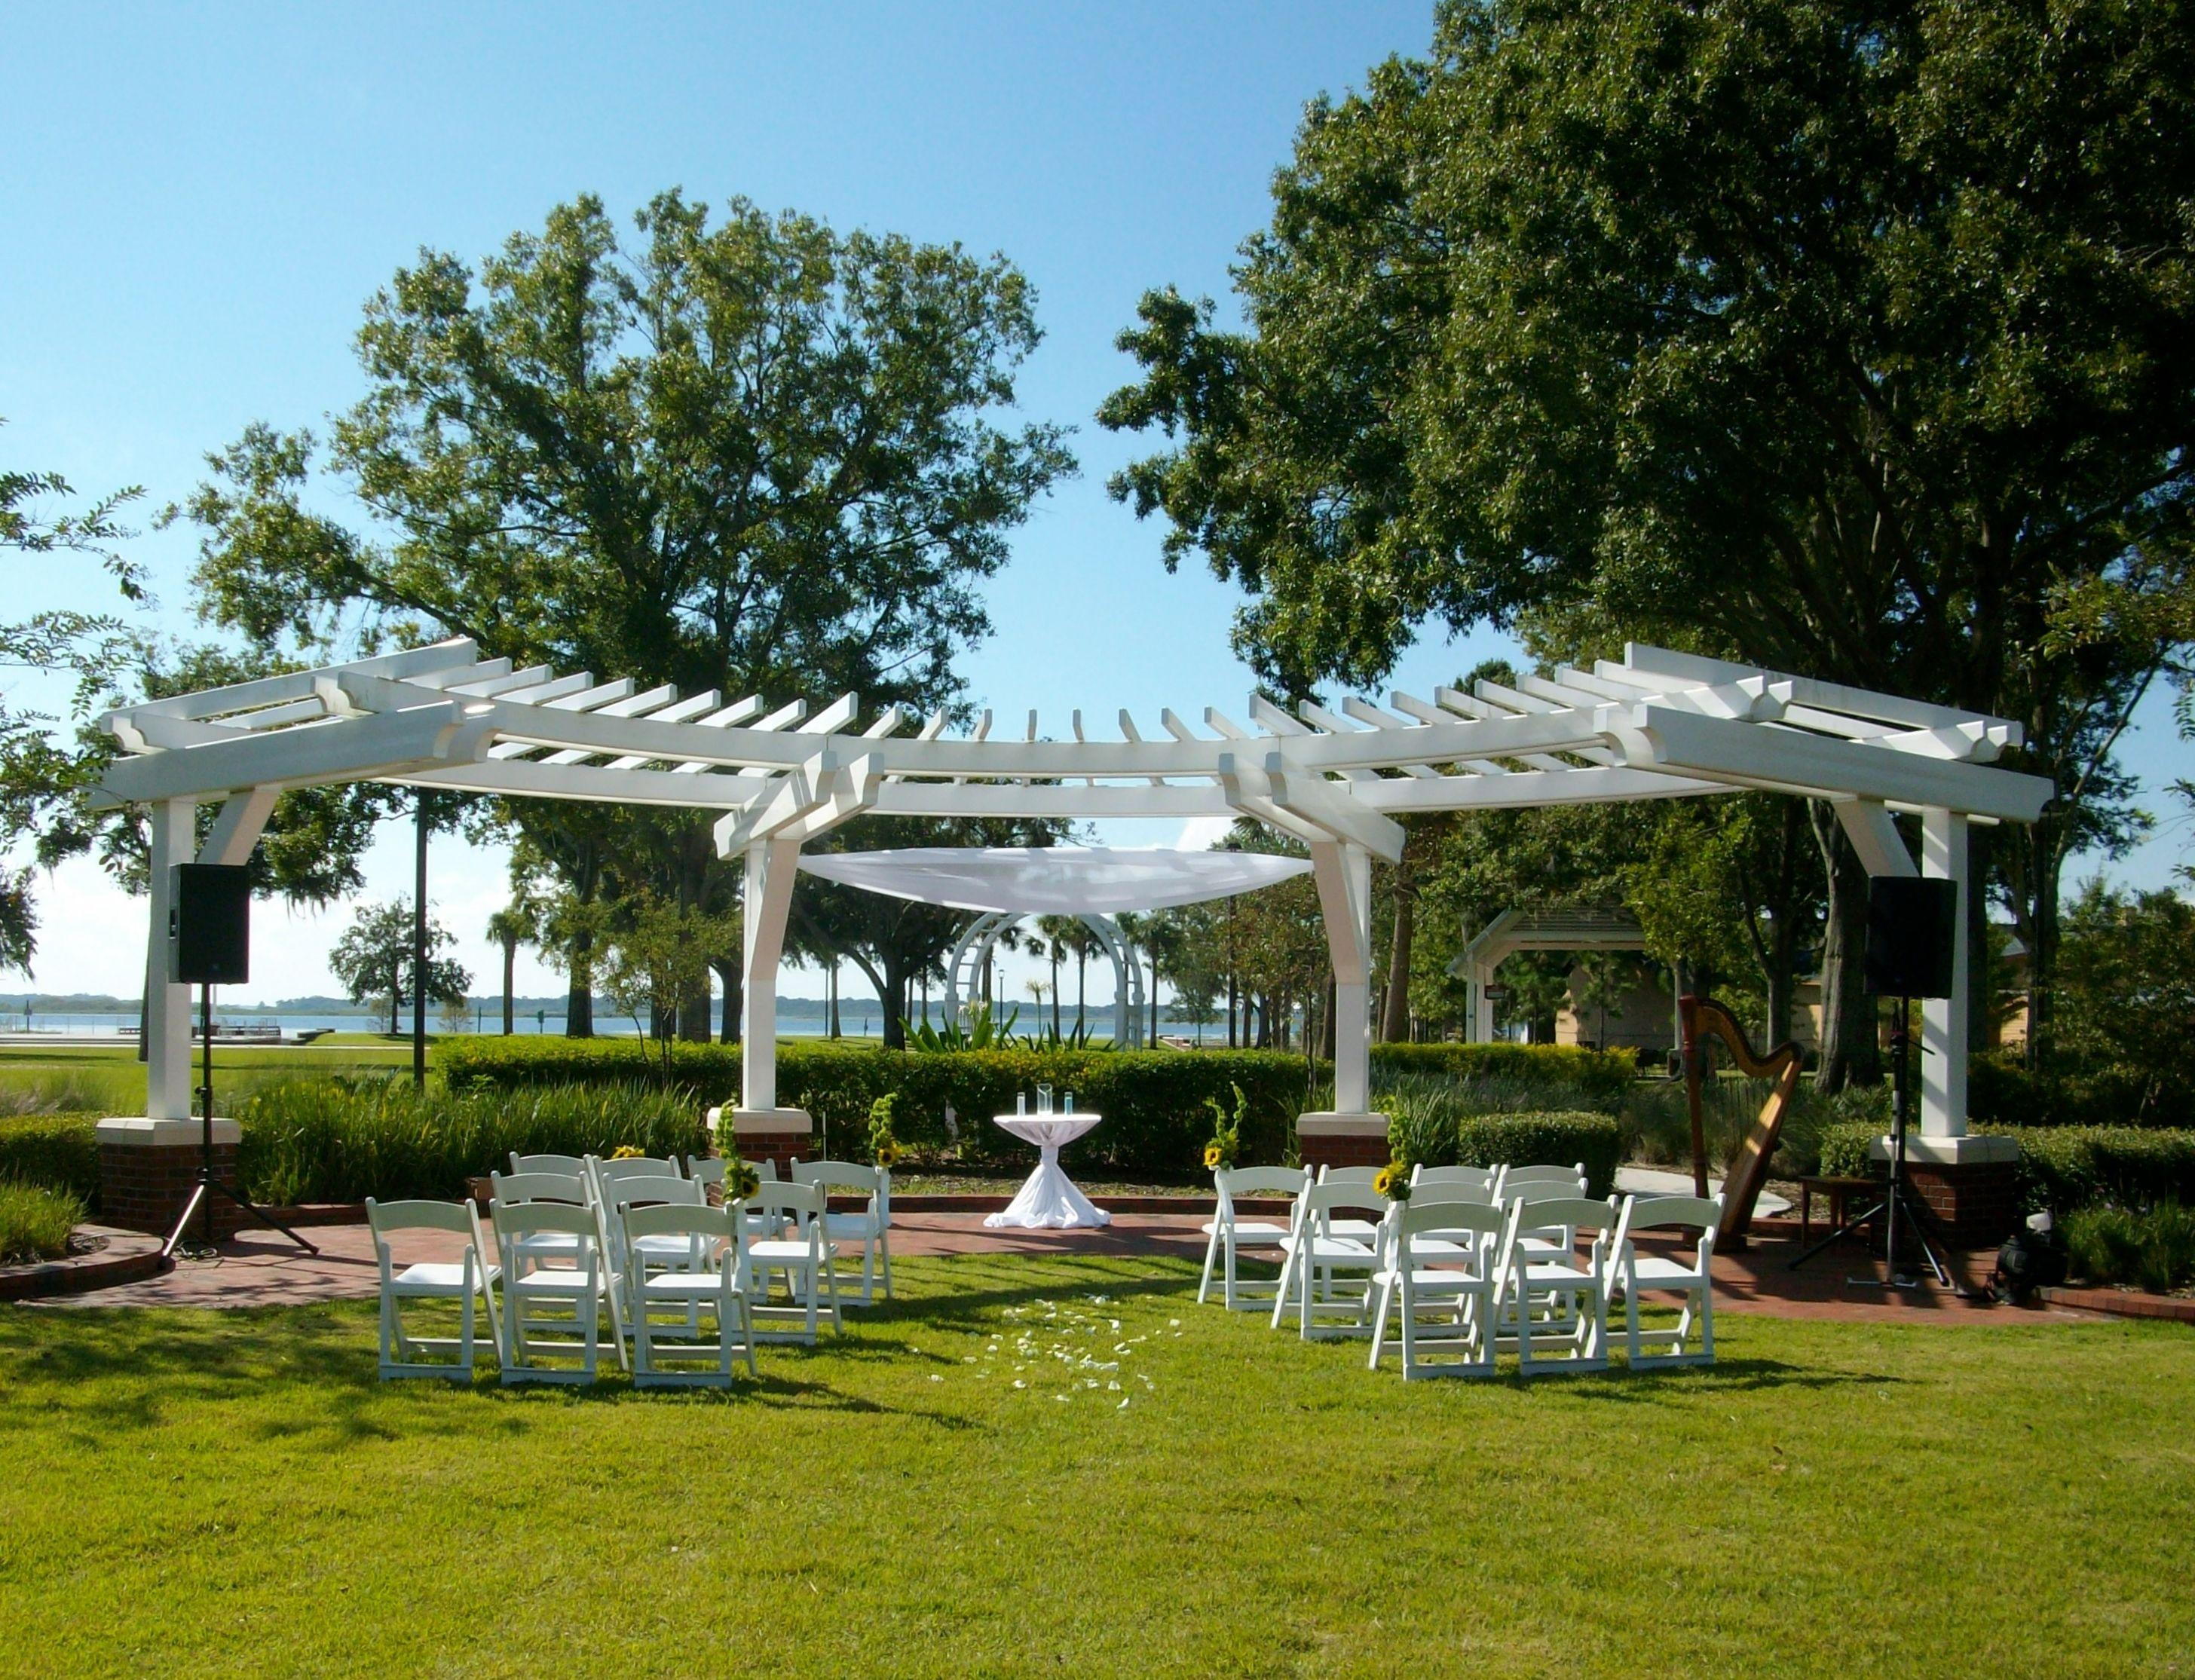 Trellis Outdoor Wedding Ceremonies: Wedding Trellis At Kissimmee Lakefront In Florida